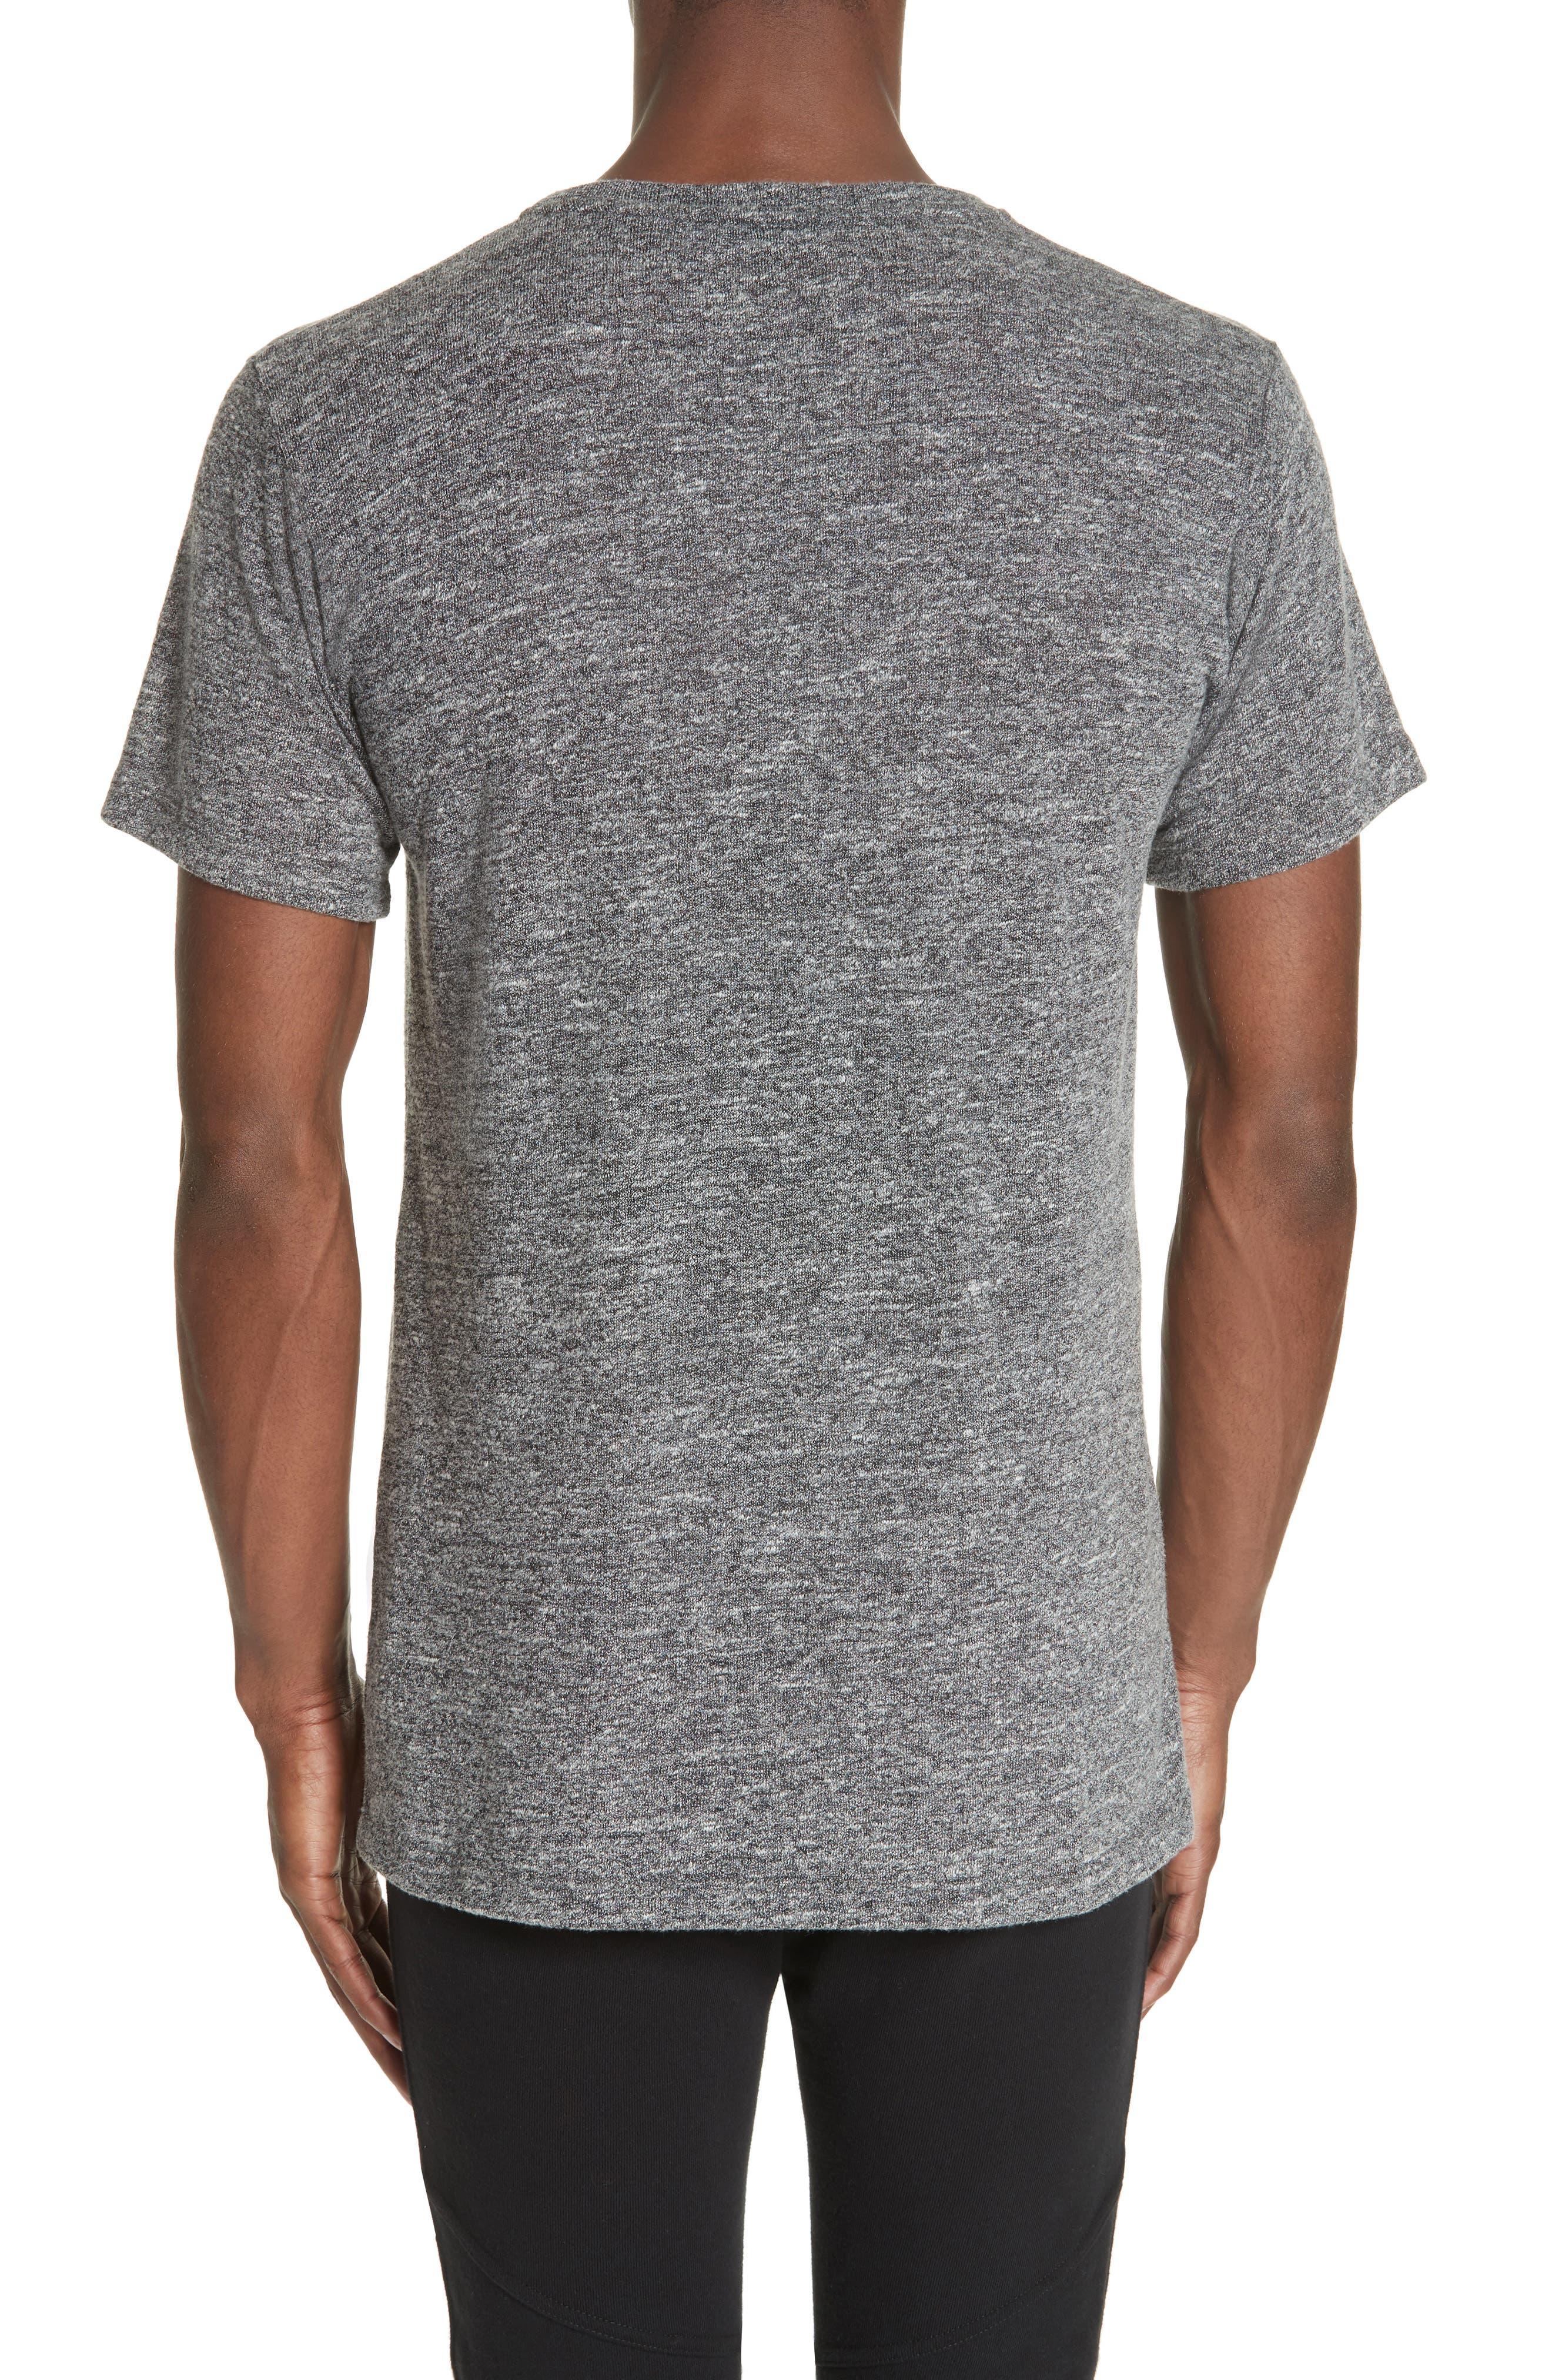 Classic Co-Mix Crew T-Shirt,                             Alternate thumbnail 2, color,                             CHARCOAL